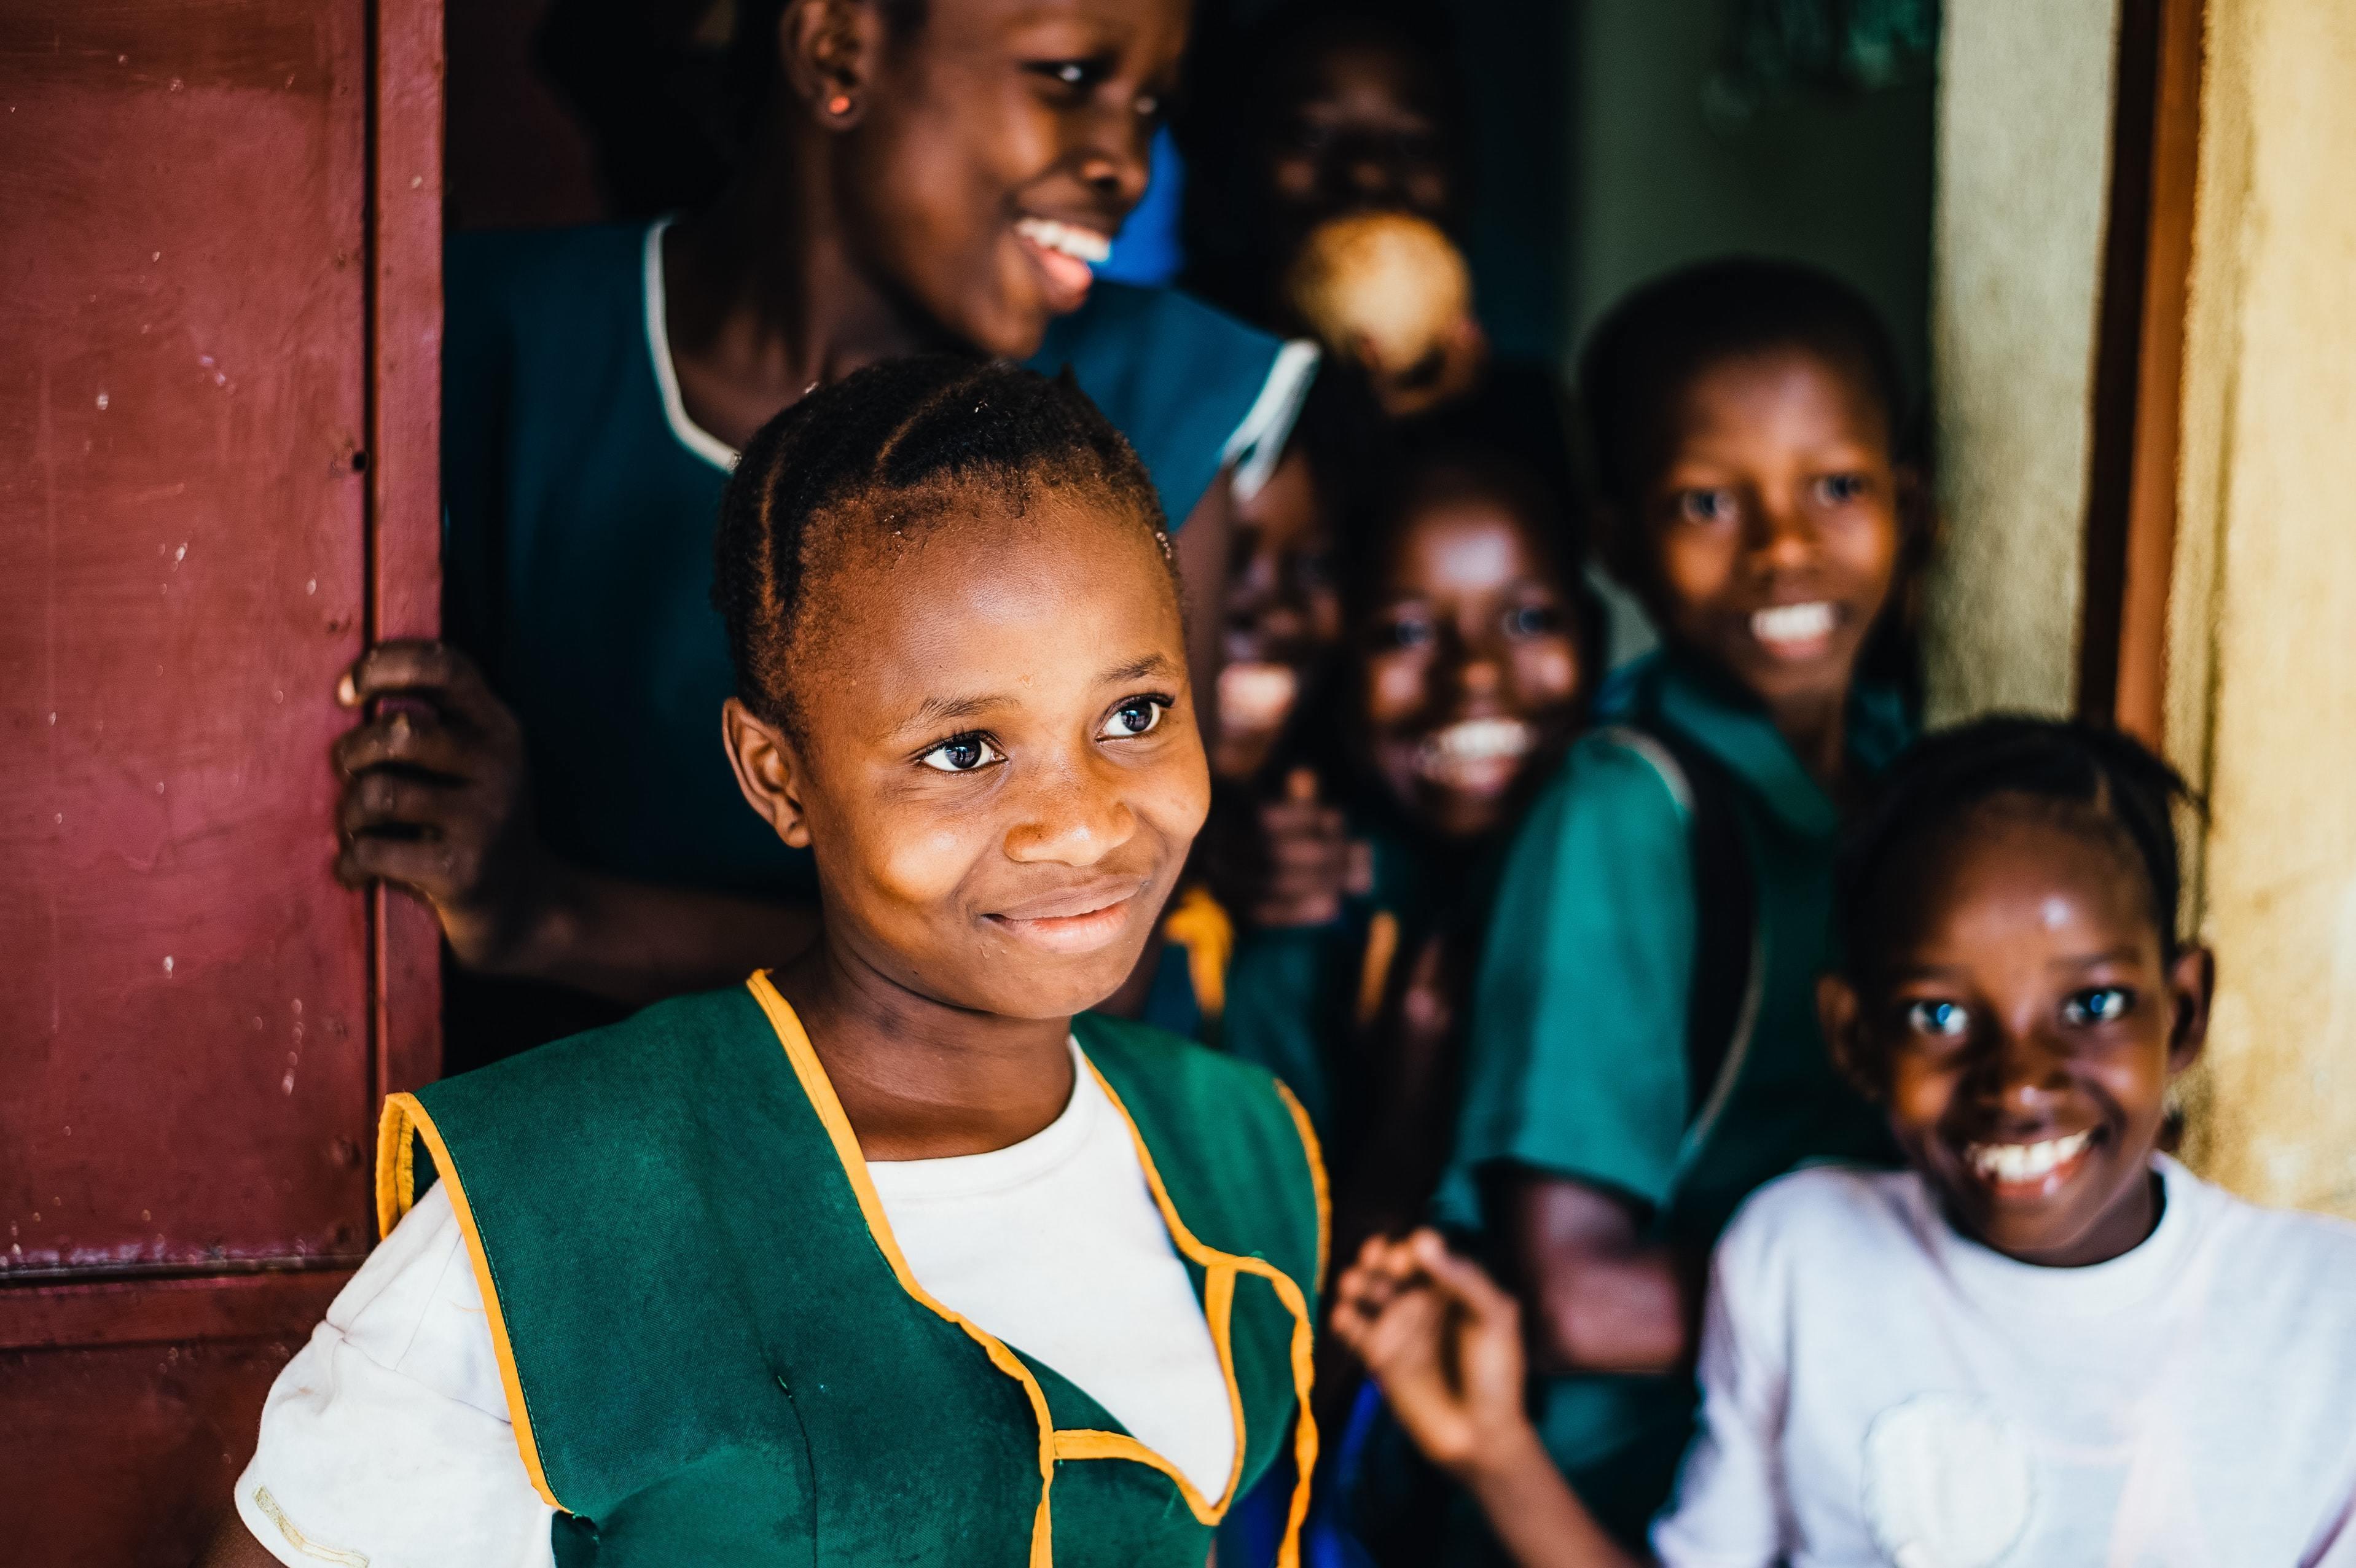 School children from Sierra Leone.